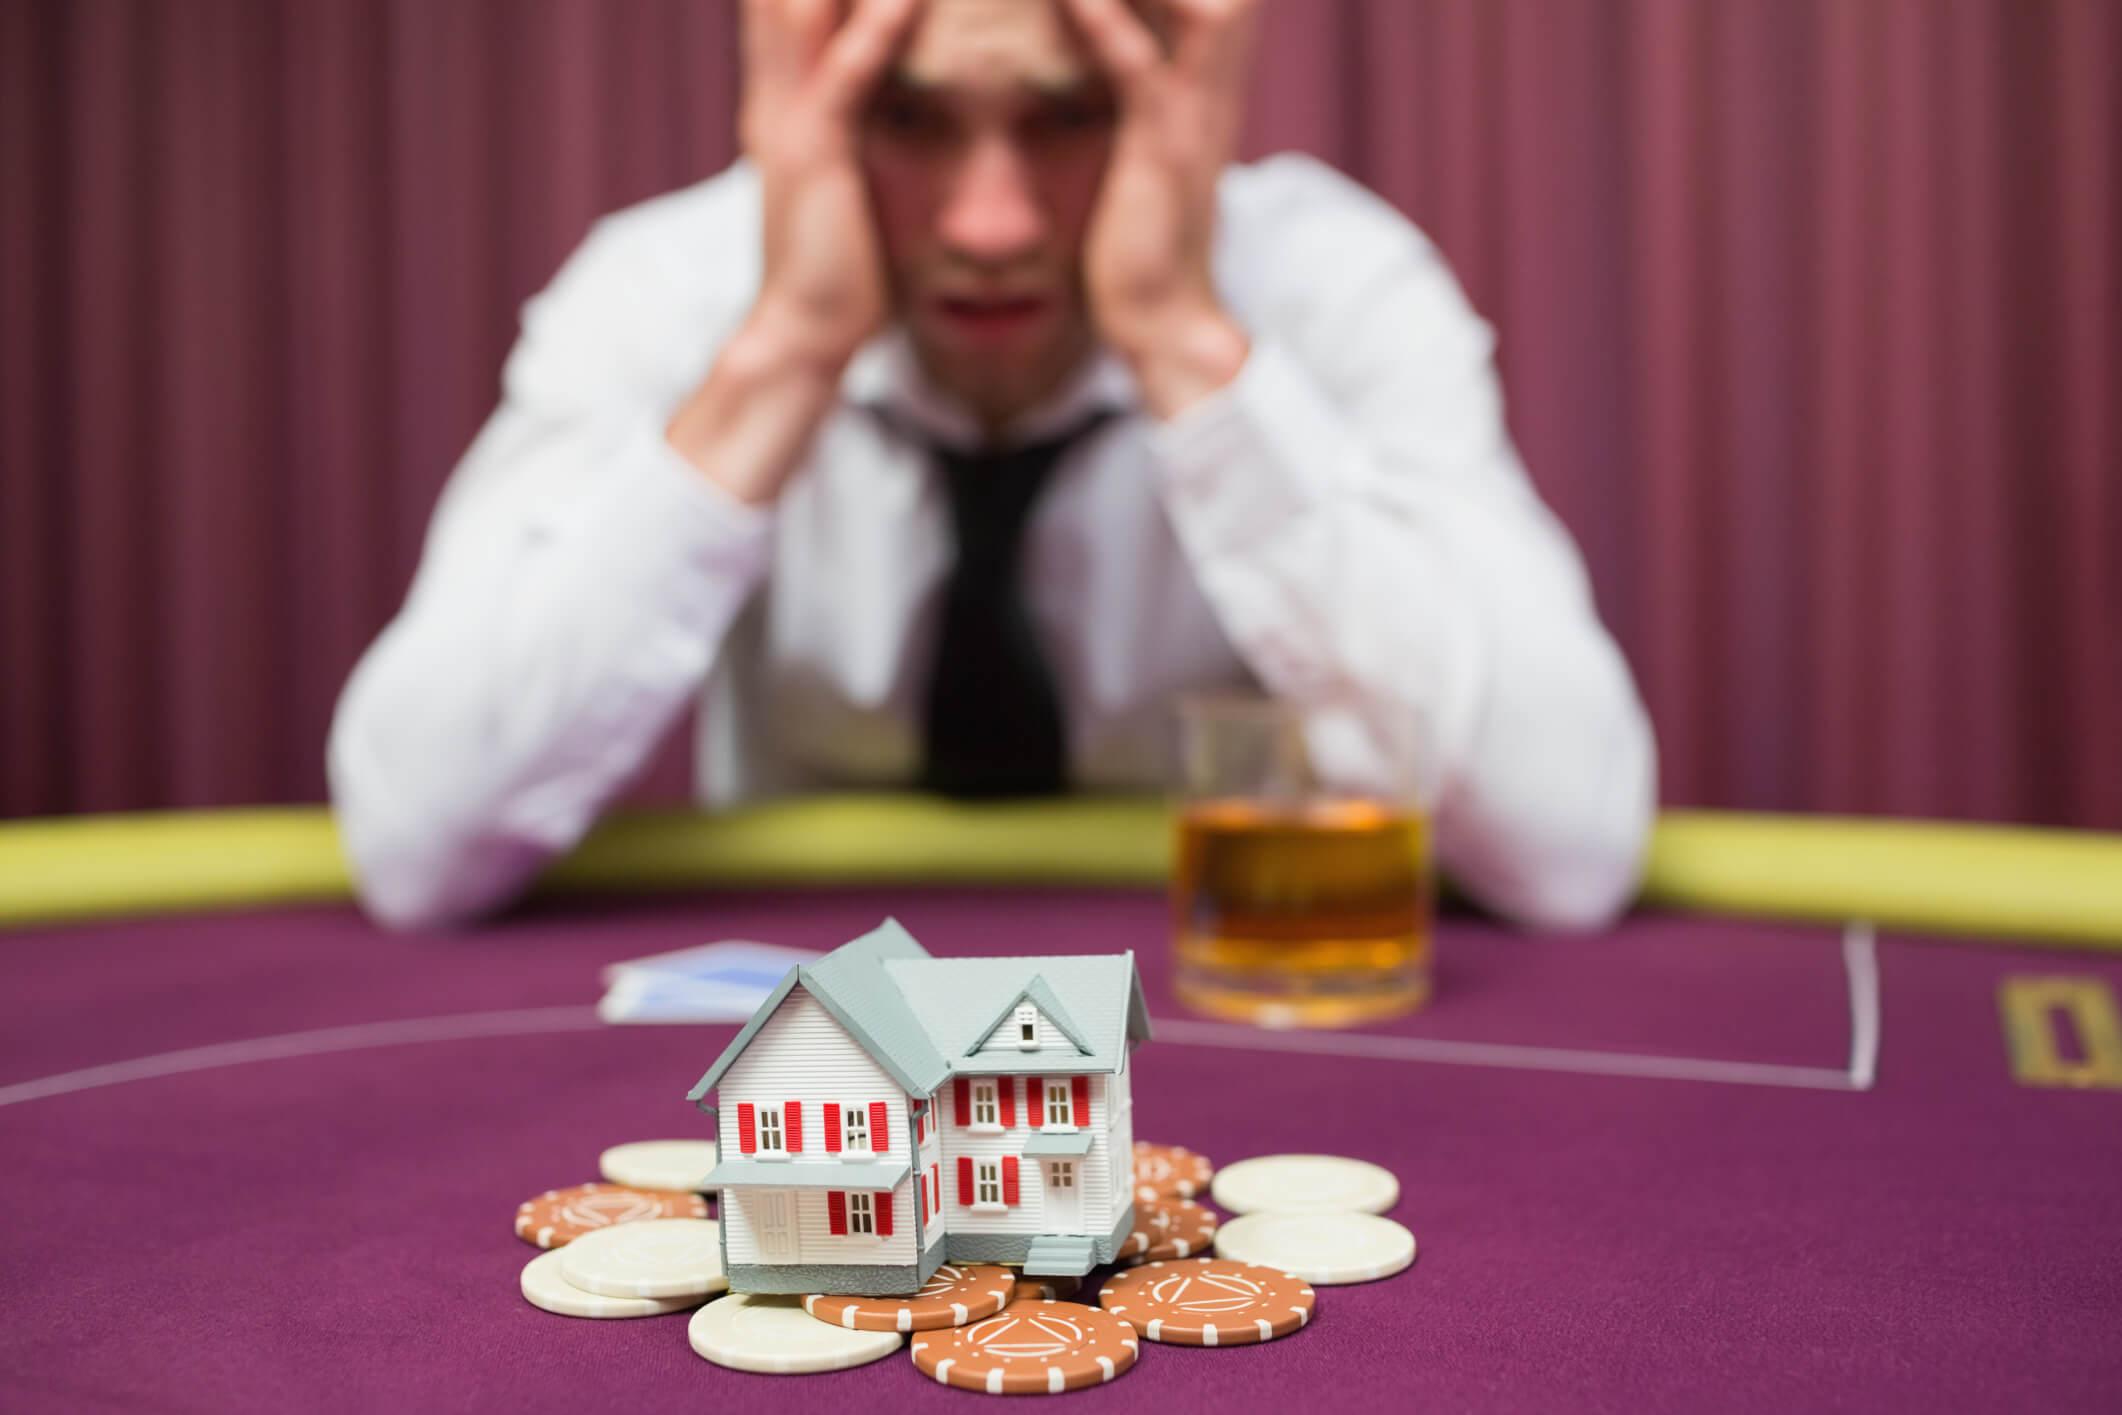 gambling problems blog bestbingouk